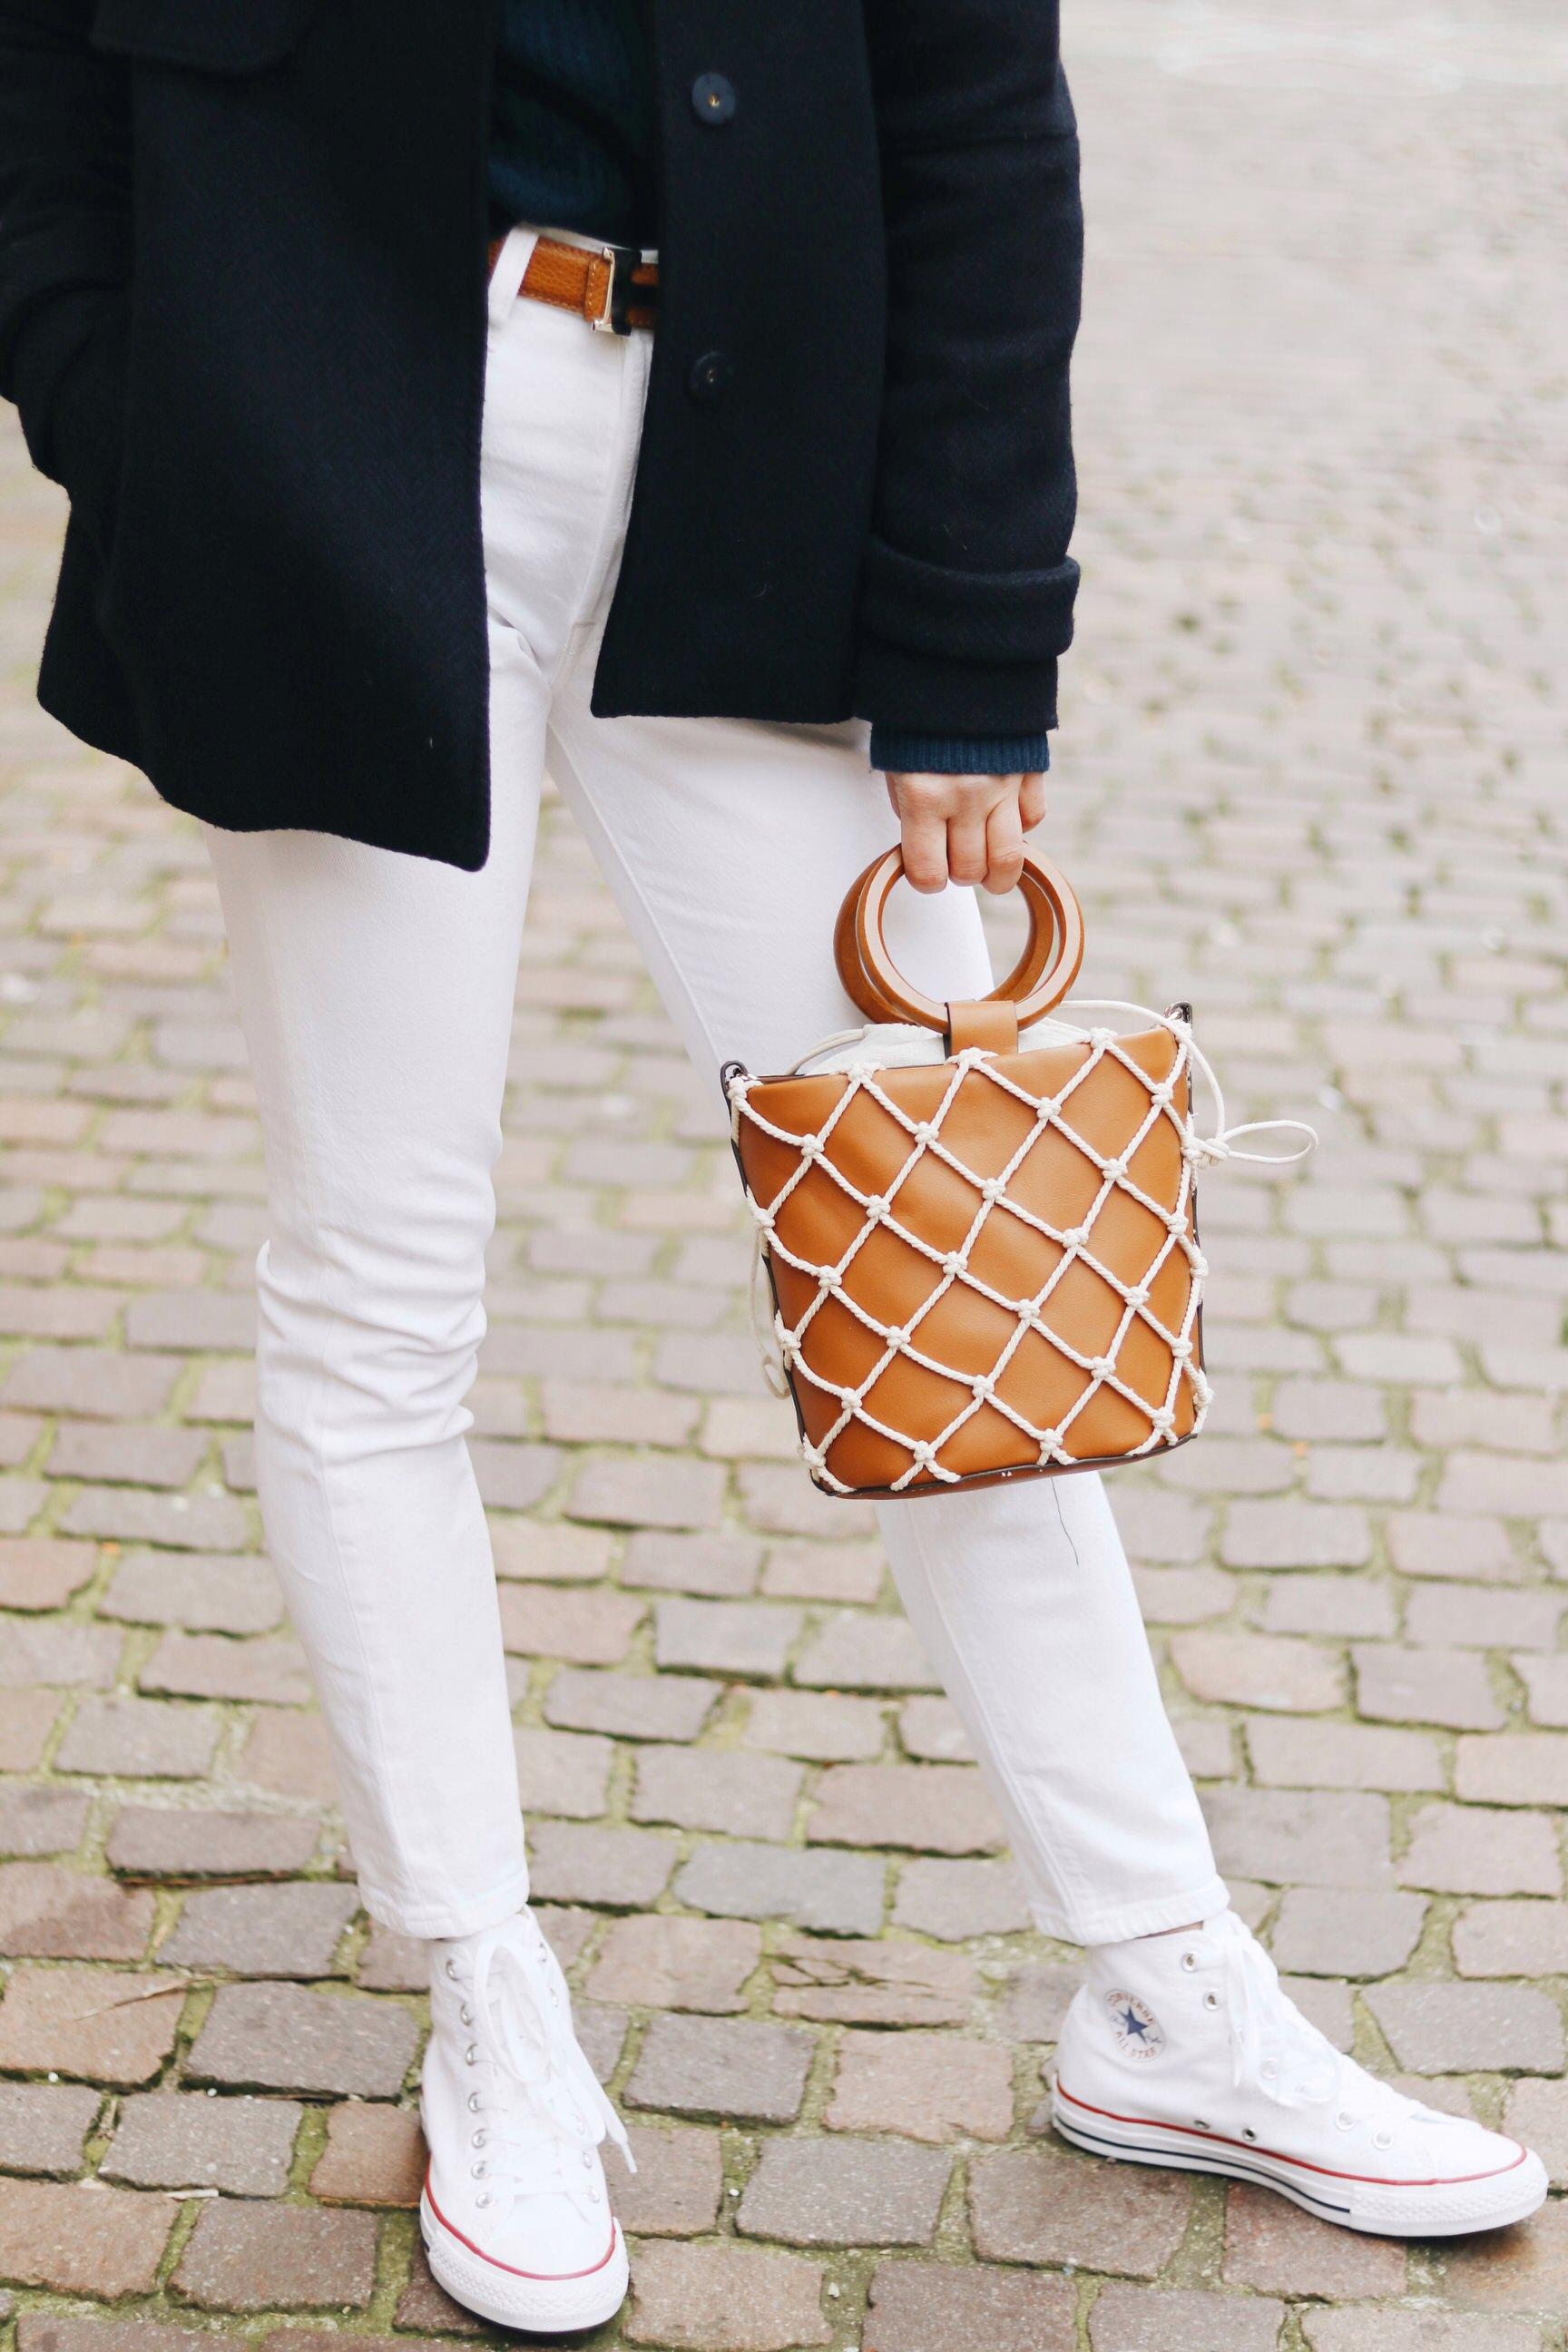 Mom Jeans weiss kombinieren Chucks Ring Bag Tasche braun Mango Outfit streetstyle Fashionblog Modeblog